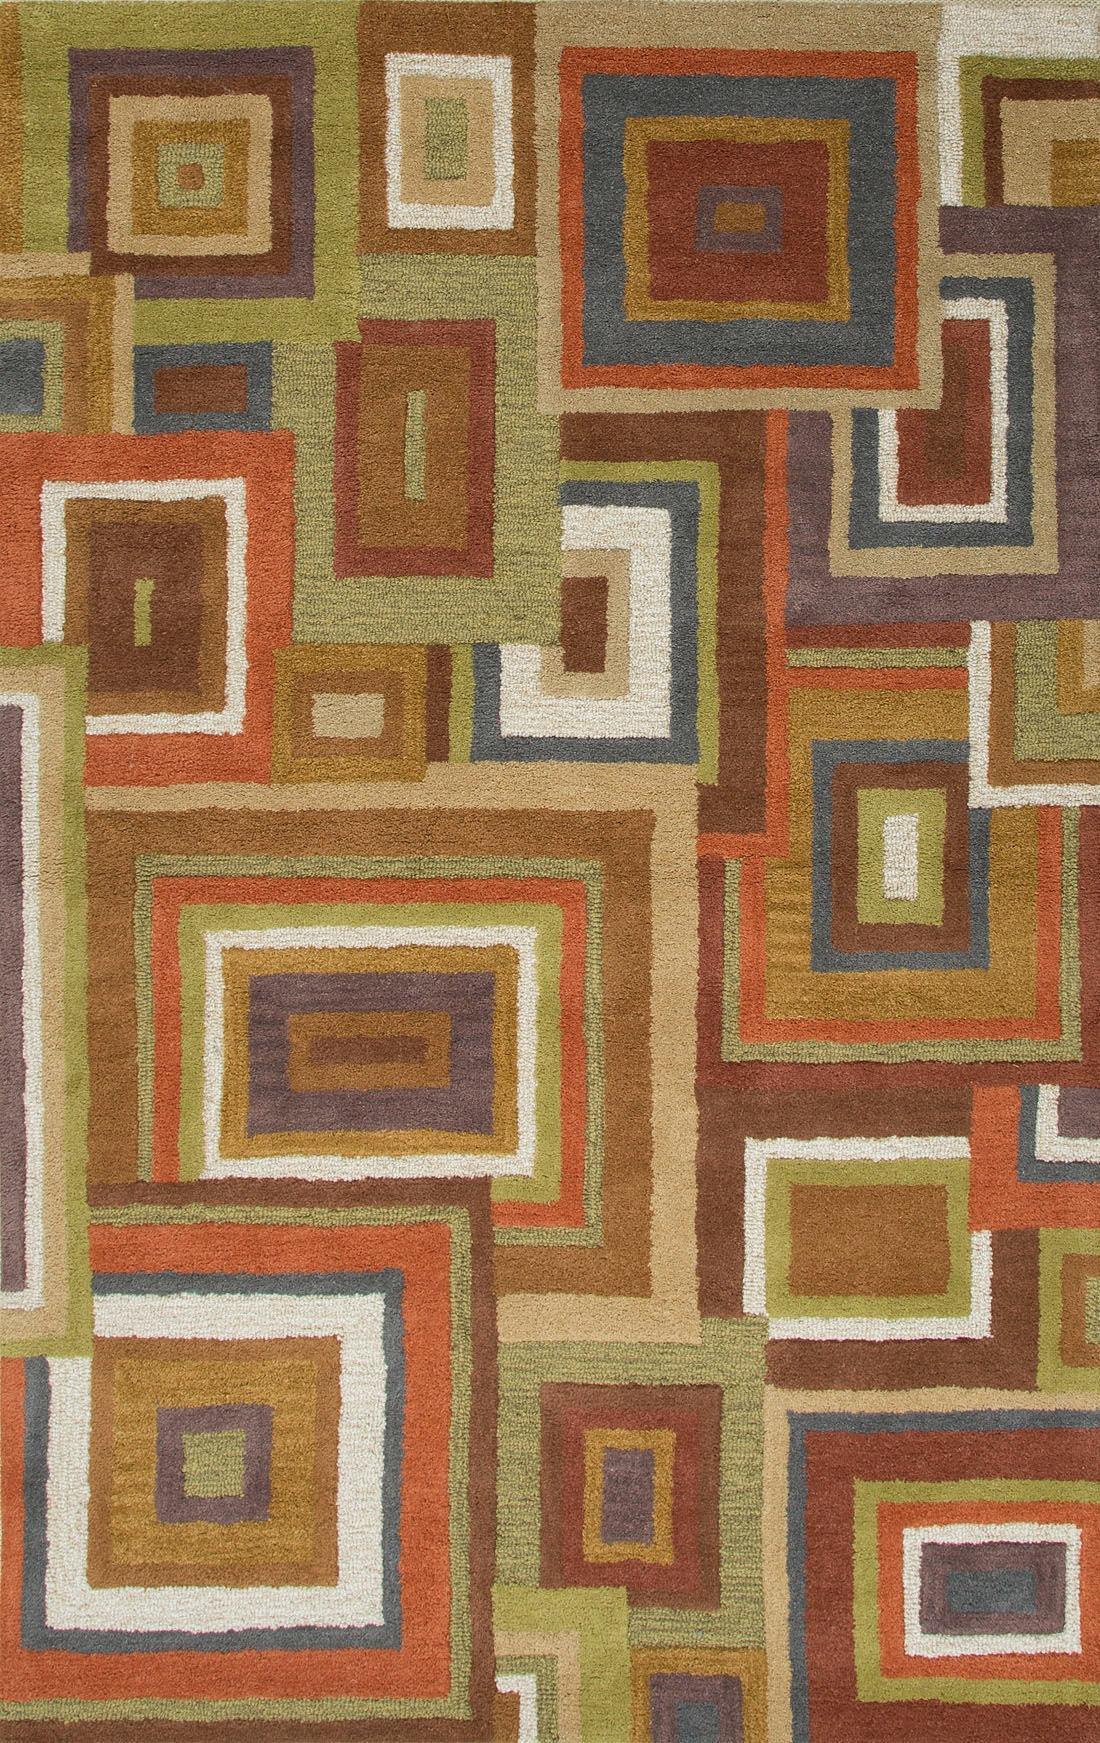 Jaipur Rugs Floor Coverings Hand Tufted Durable Wool Red Green Area